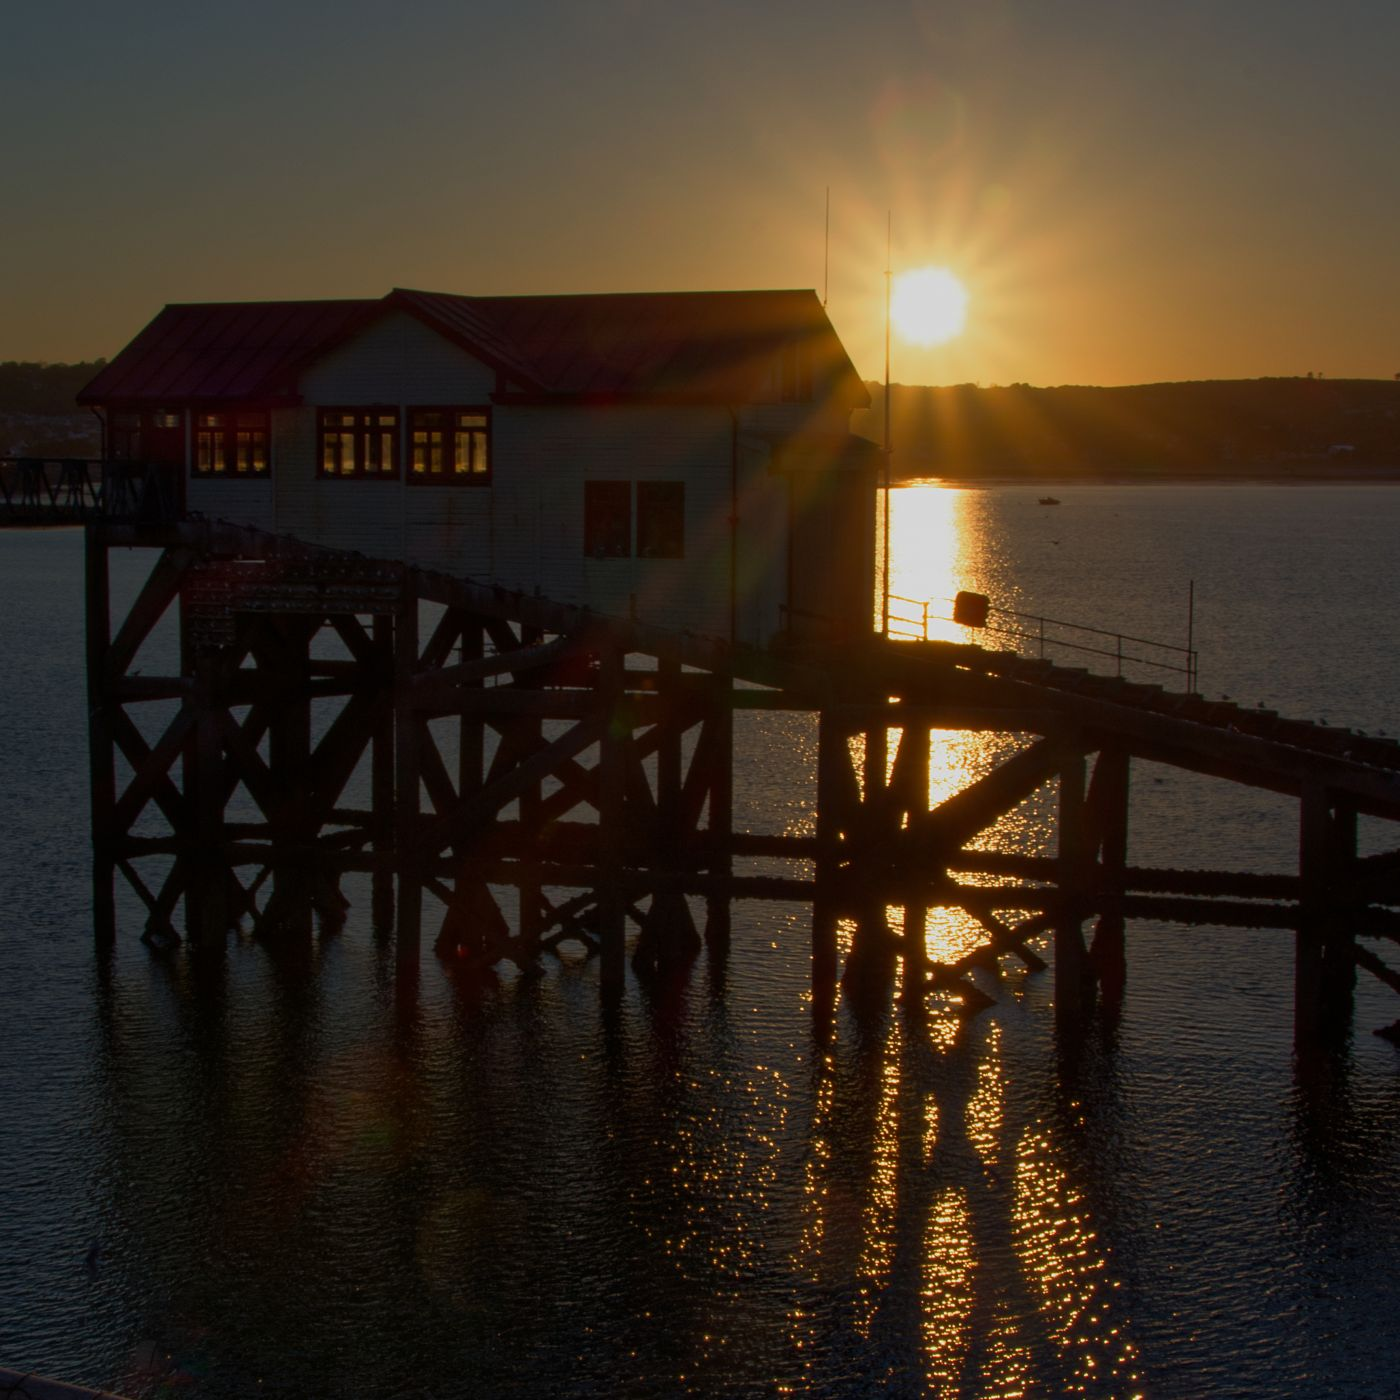 Old RNLI Lifeboat Station, Mumbles Pier, United Kingdom